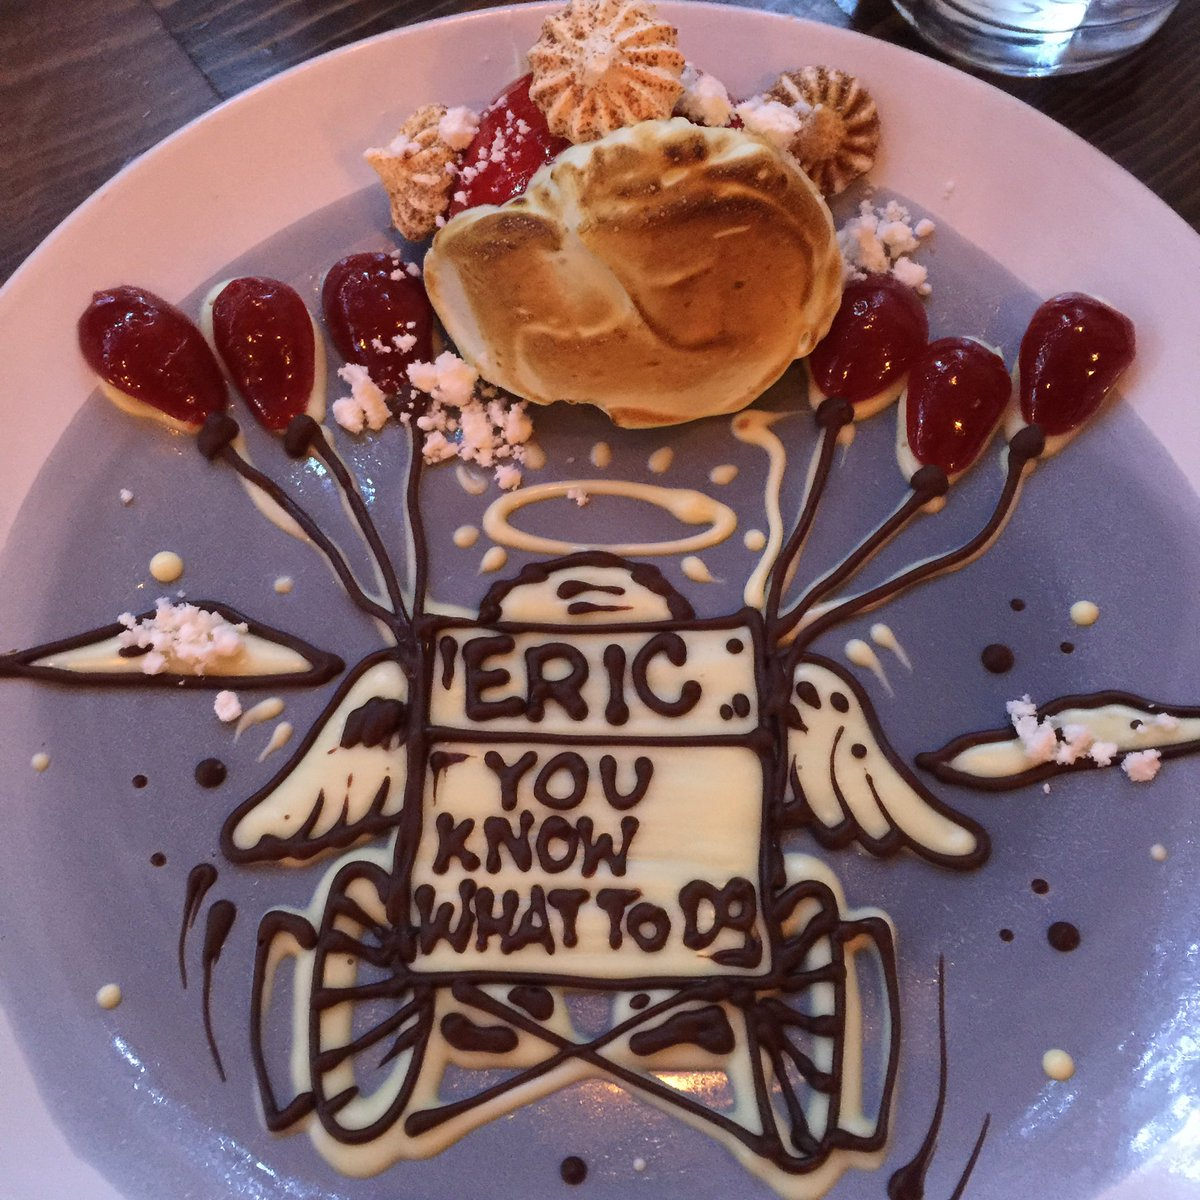 RT @jimmykimmel: A beautiful tribute to #ErictheActor from @Barans2239 @HowardStern https://t.co/uBU16lYOSO